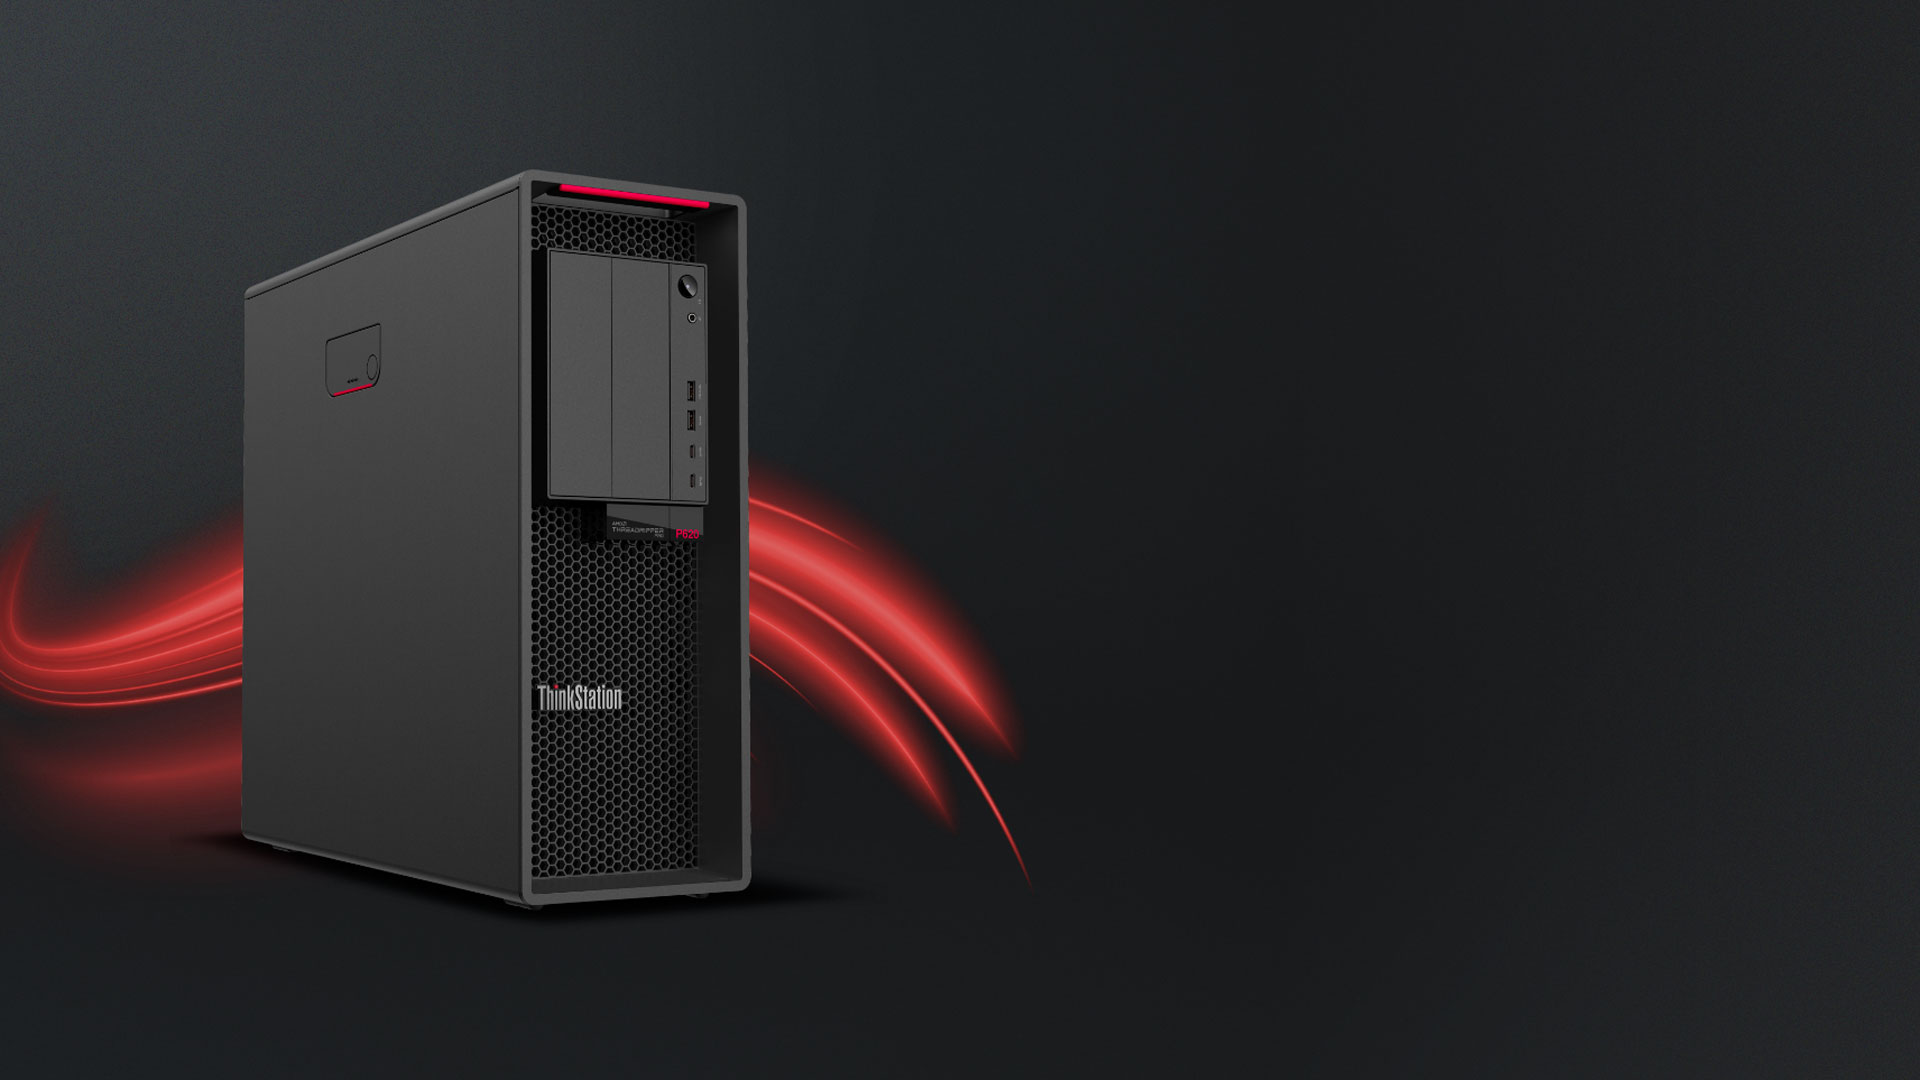 Threadripper Pro 64 Core Amd Cpu Lives In Lenovo S Desktop 9to5toys